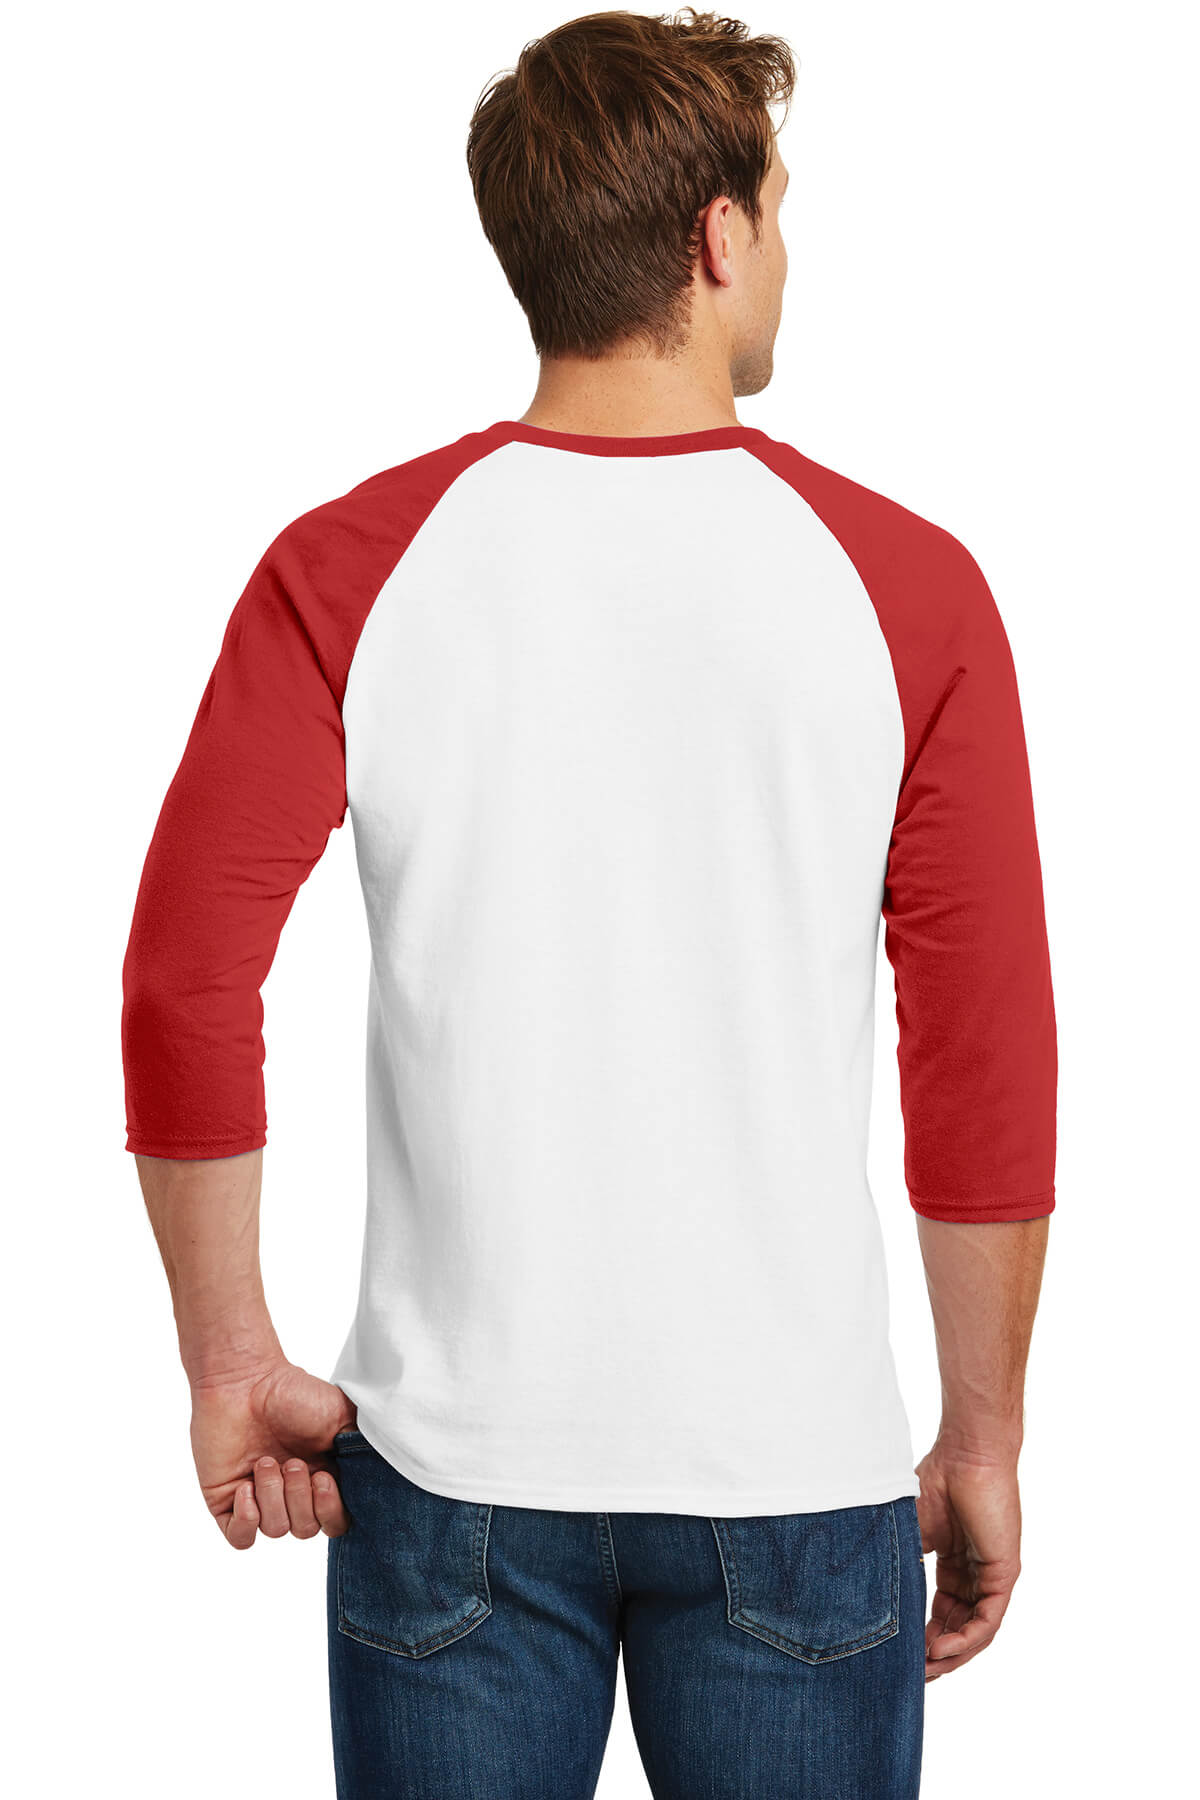 5700-white-red-2